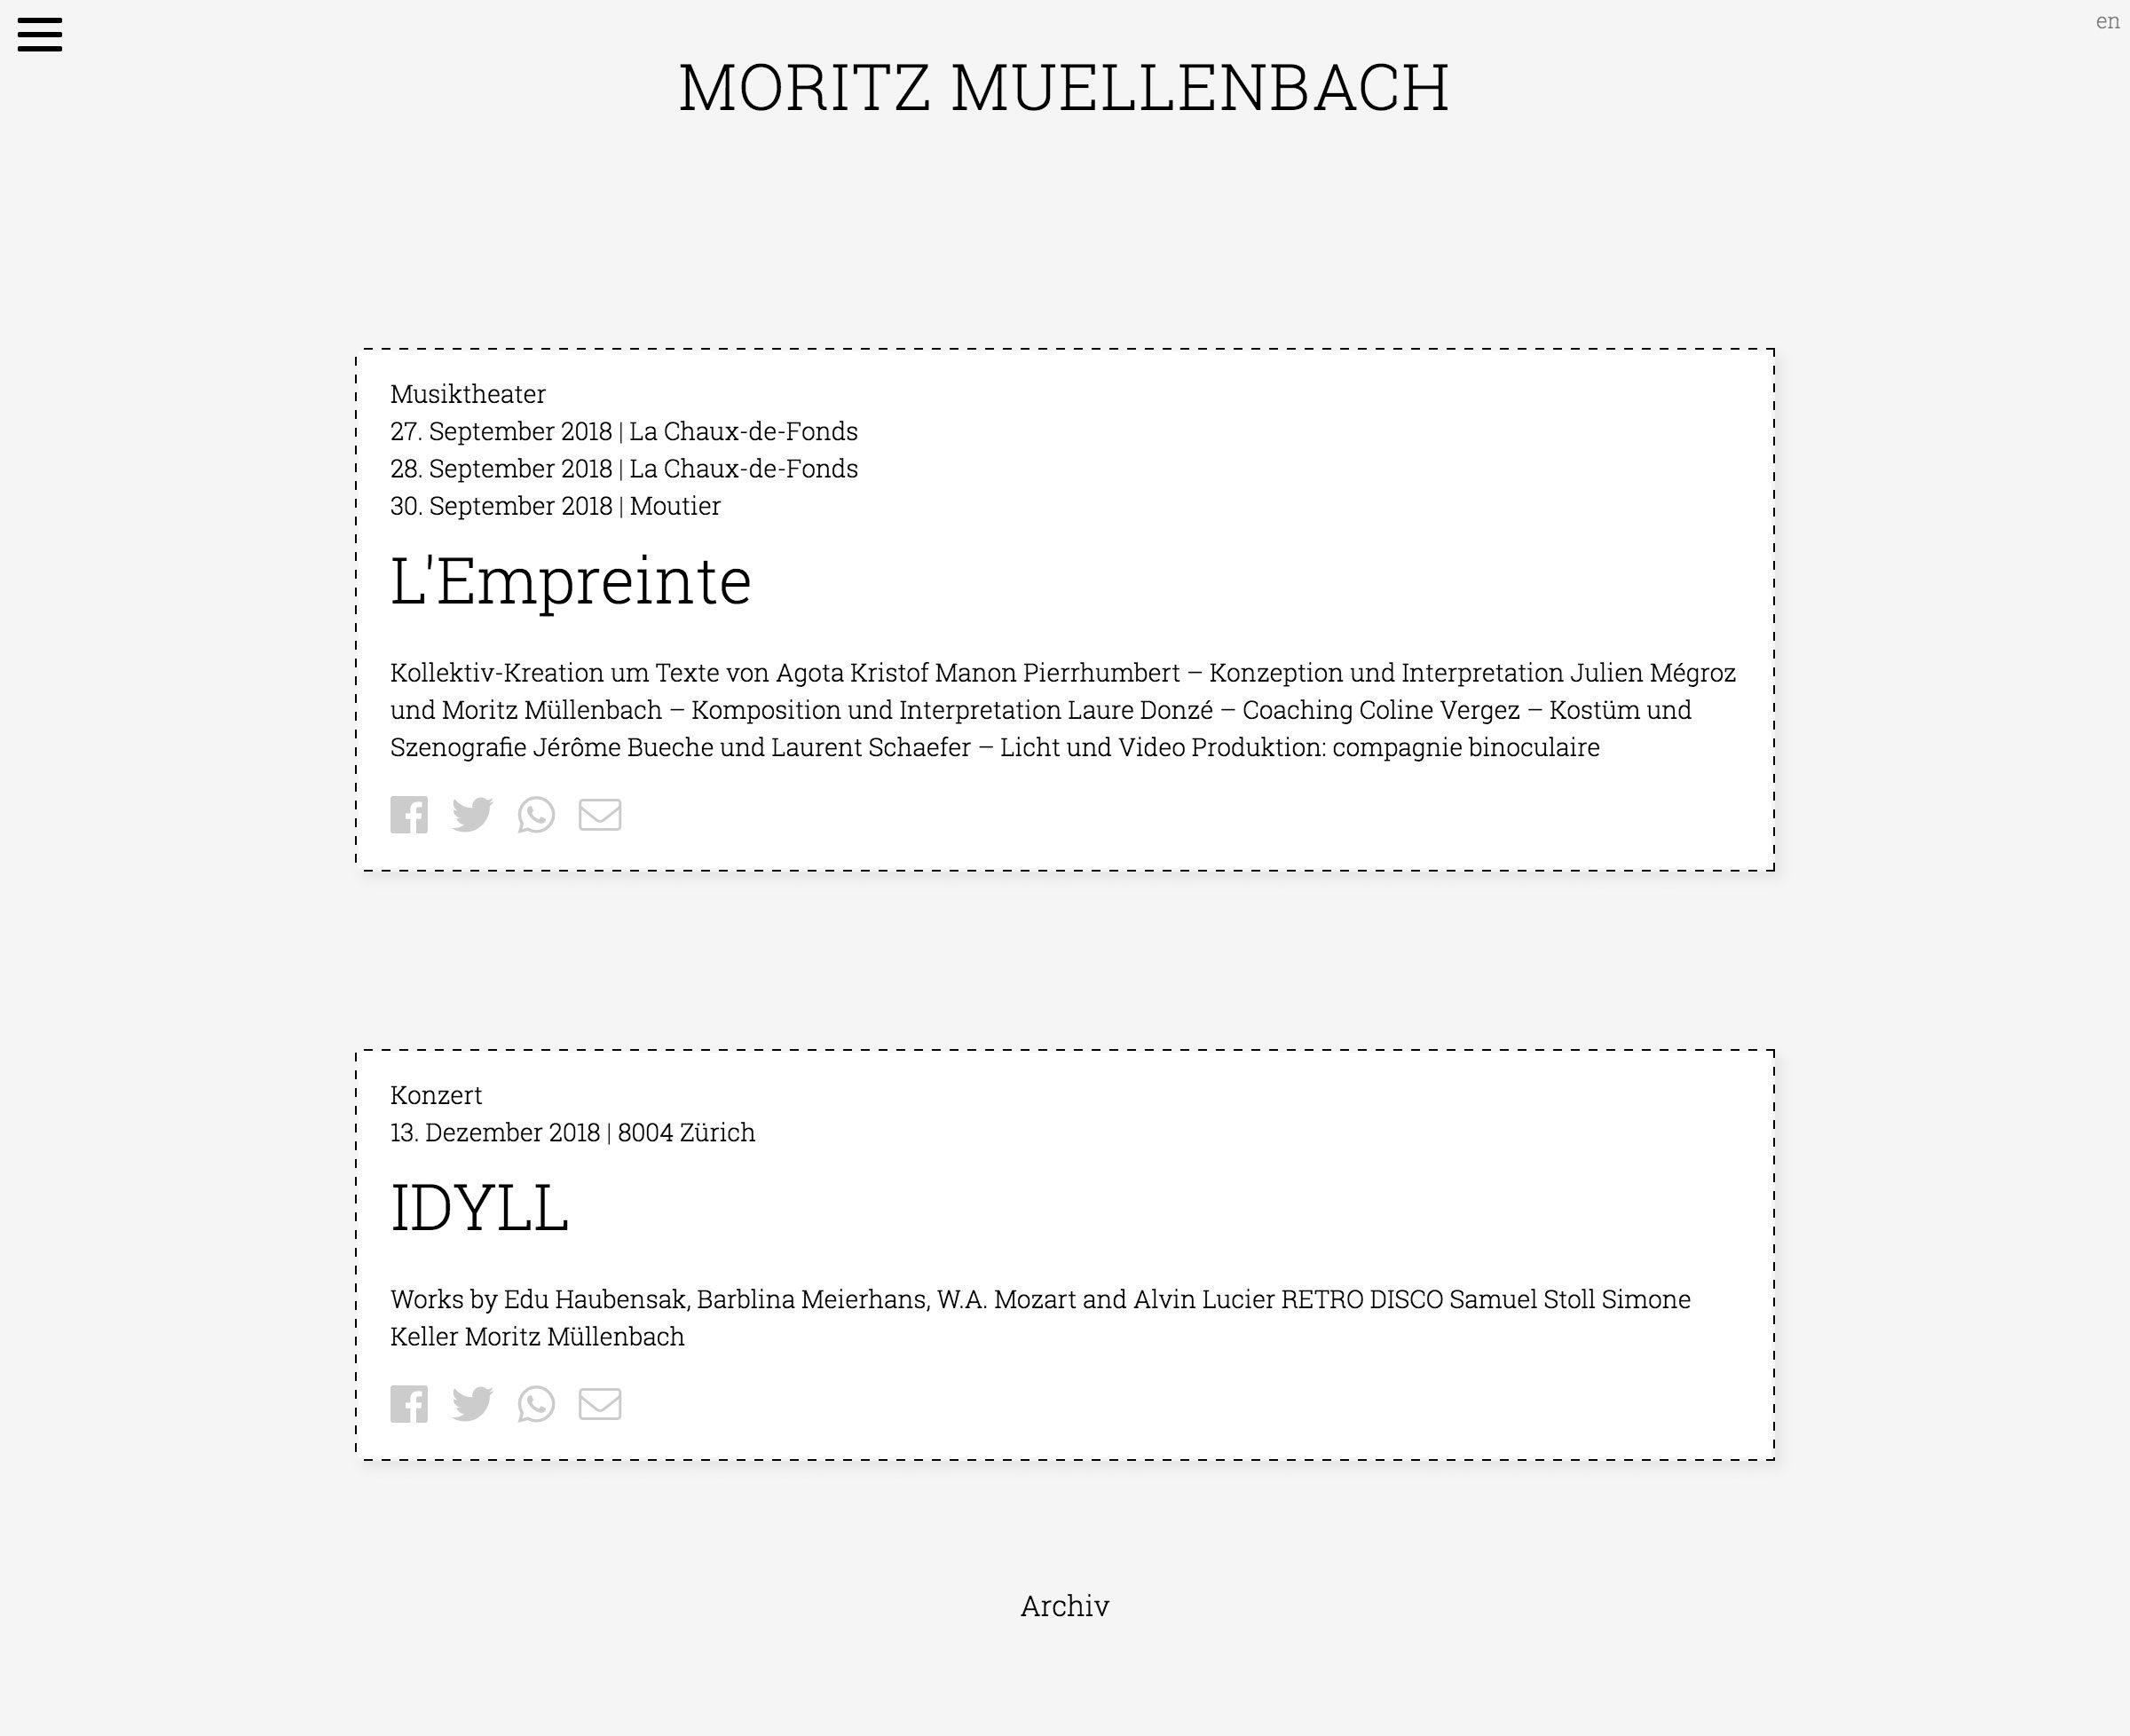 Moritz Muellenbach